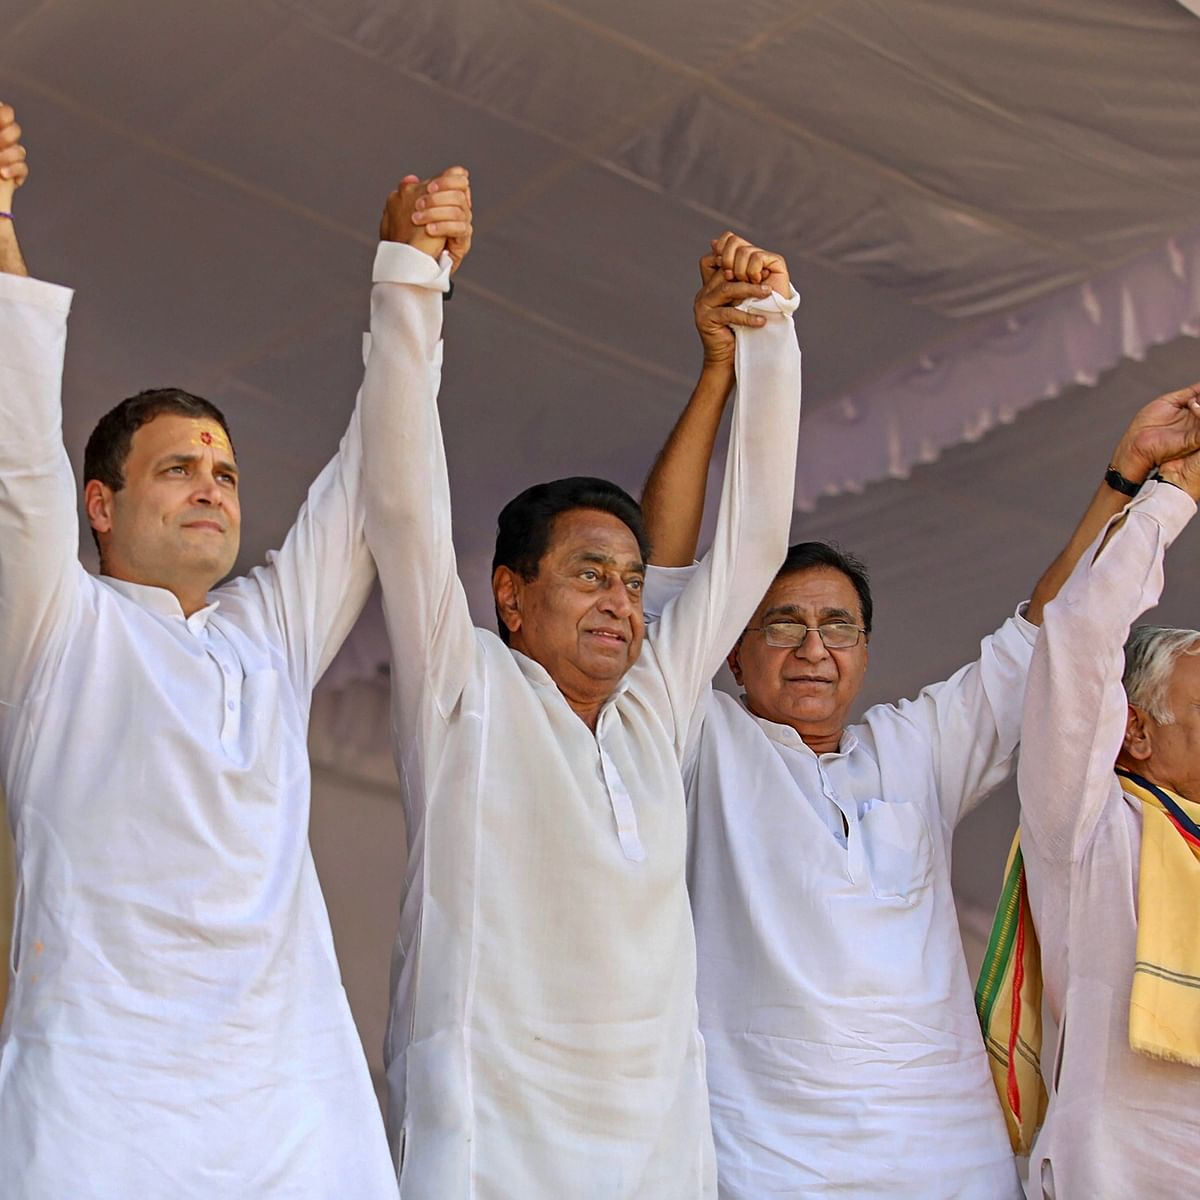 Kamal Nath Clears Madhya Pradesh Farm Loan Waiver After Taking Oath